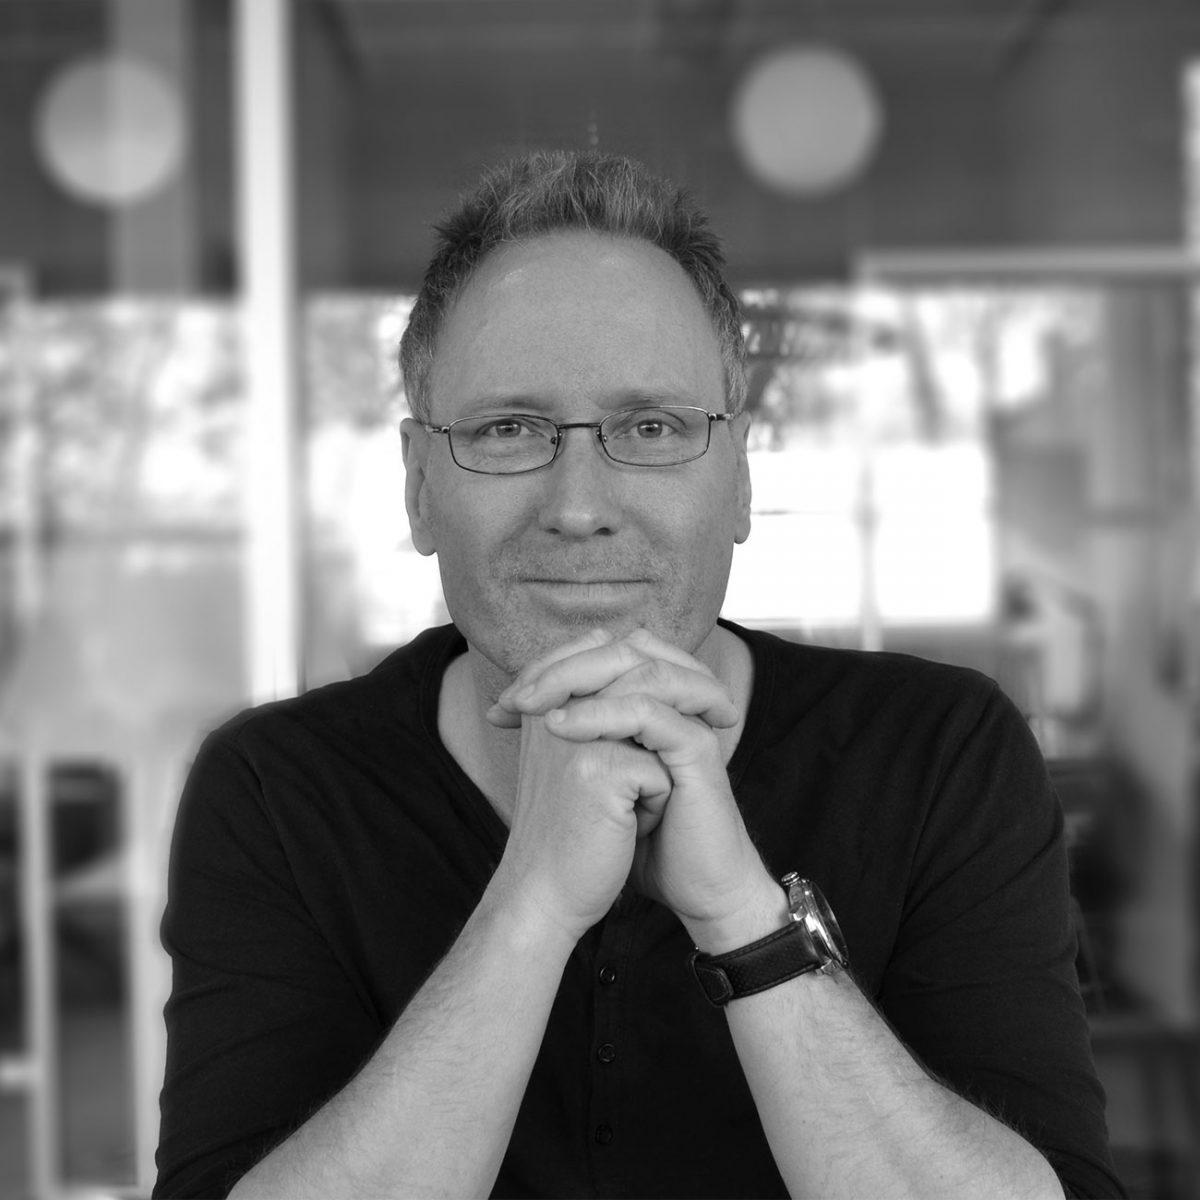 http://horisontgruppen.dk/wp-content/uploads/2016/04/Per_Christensen-1200x1200.jpg